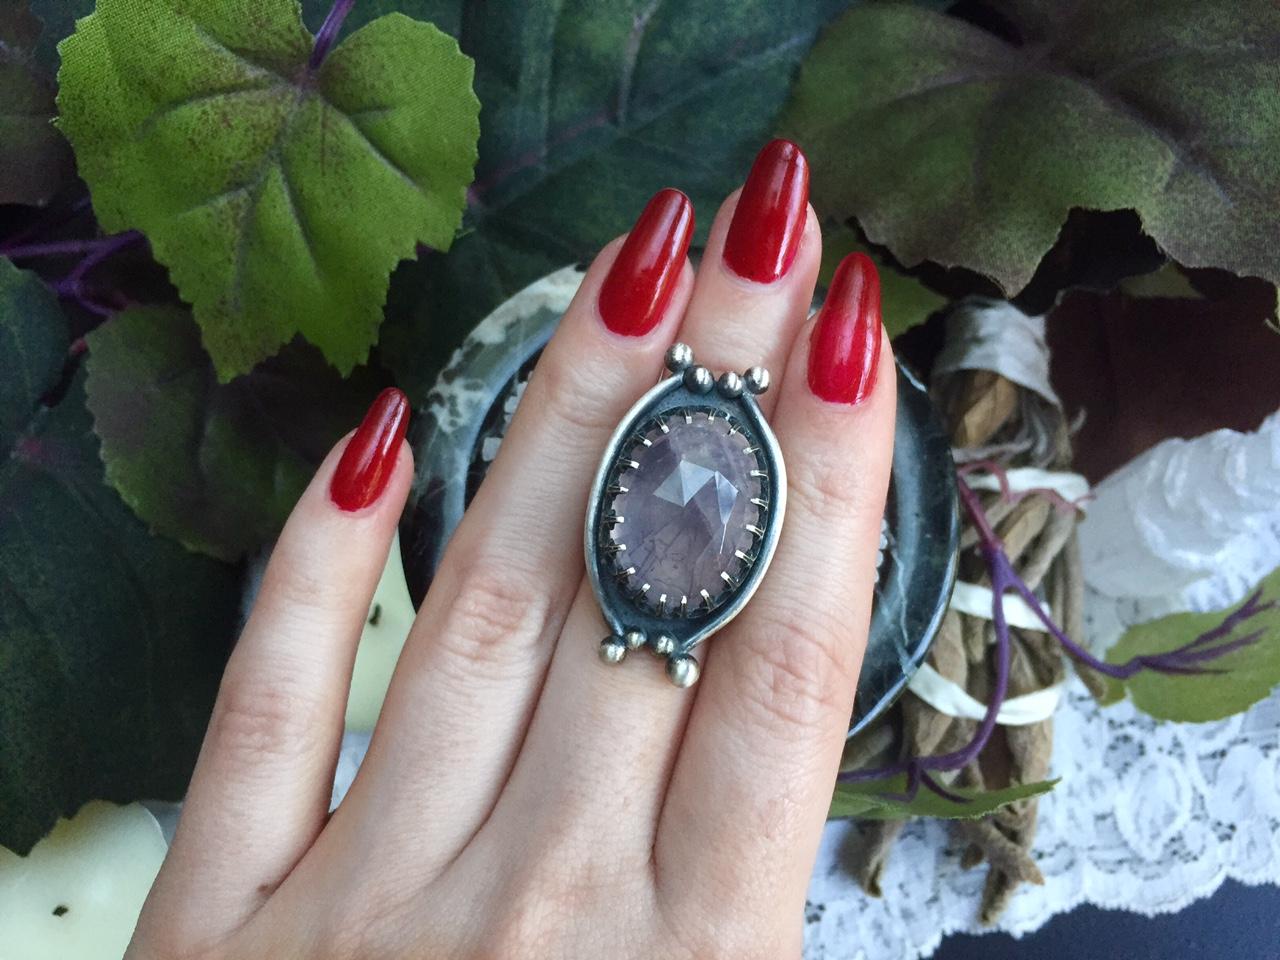 Rose Quartz Sterling Silver Bone Ring  Adjustable RingRose QuartzRose Quartz RingSpooky JewelryCreepy And CuteBone JewelryHalloween